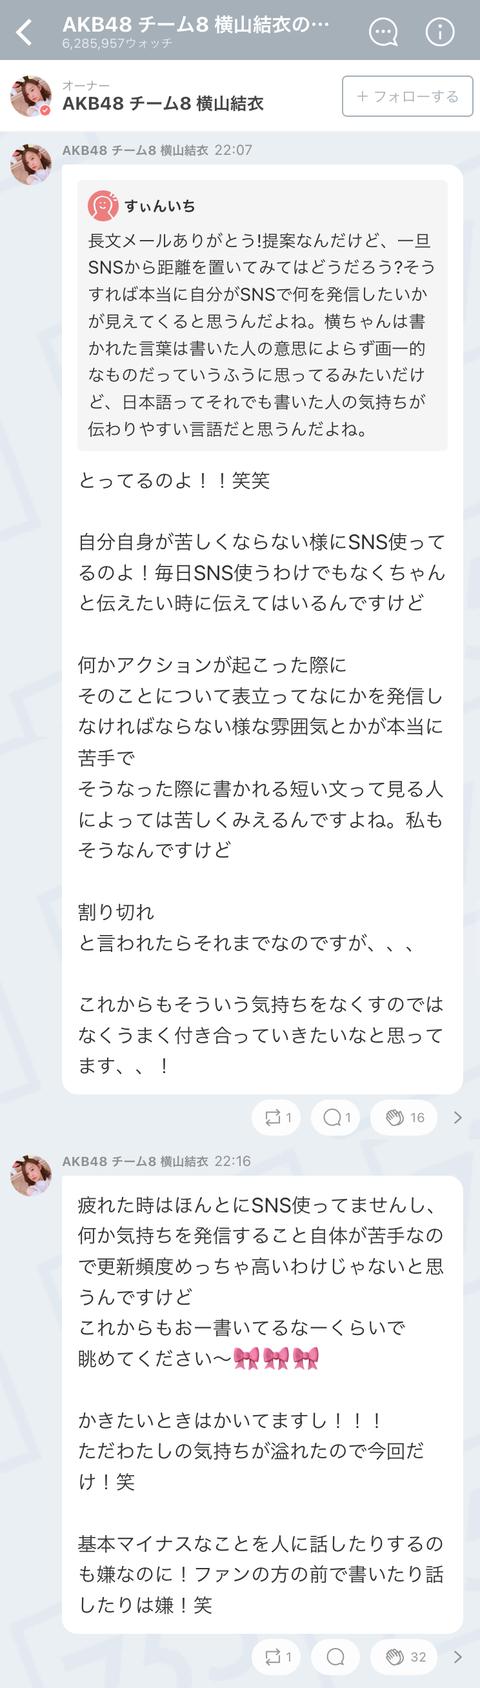 【AKB48】チーム8横山結衣さん、プラメで苦言を呈された模様